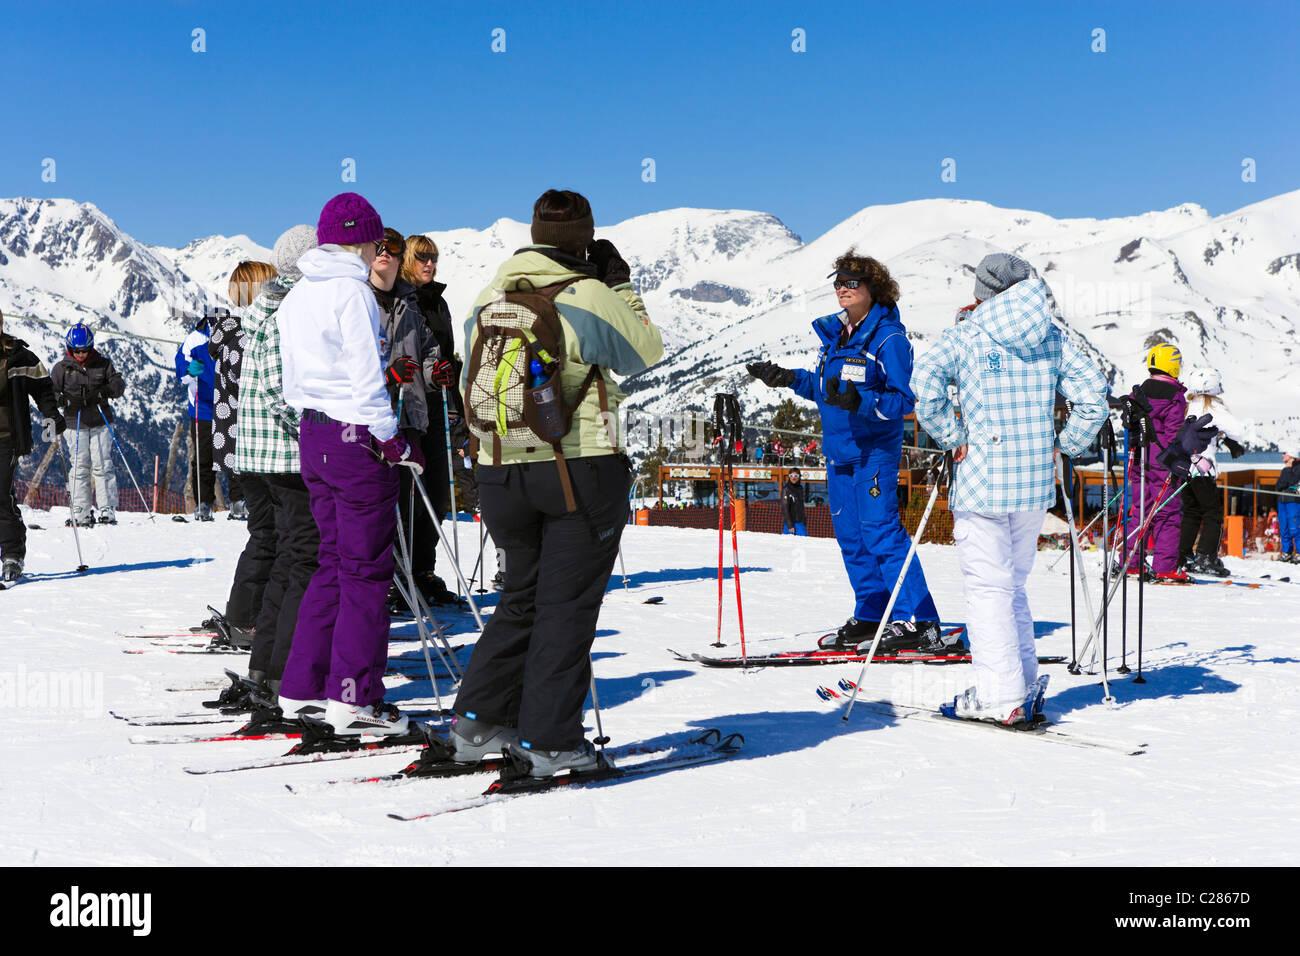 Ski school on the nursery slopes in the Espiolets ski area, Soldeu, Grandvalira Region, Andorra - Stock Image